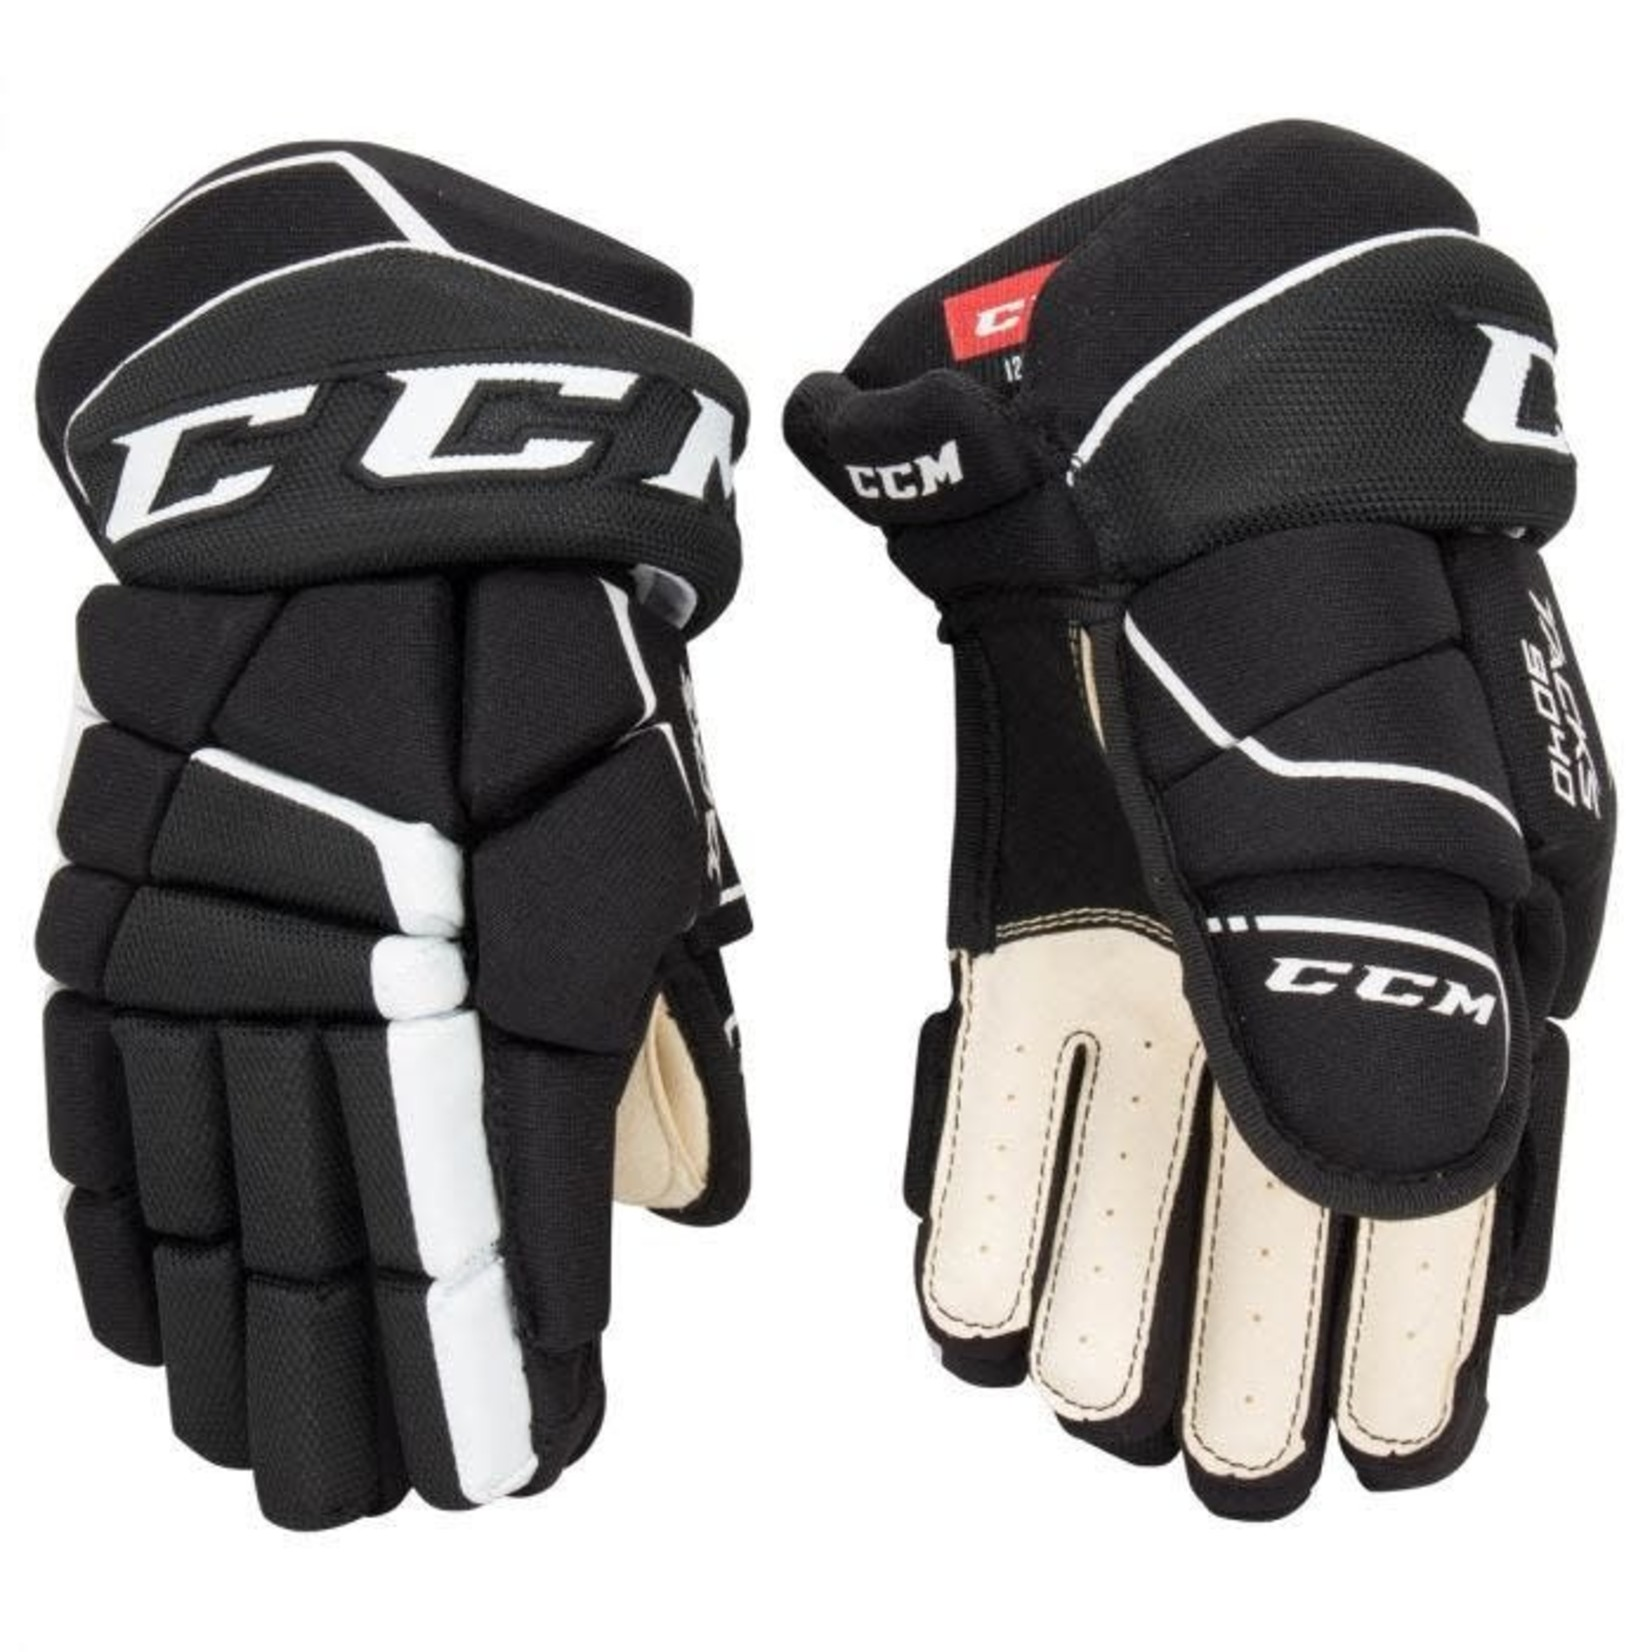 CCM CCM Hockey Gloves, Tacks 9040, Junior